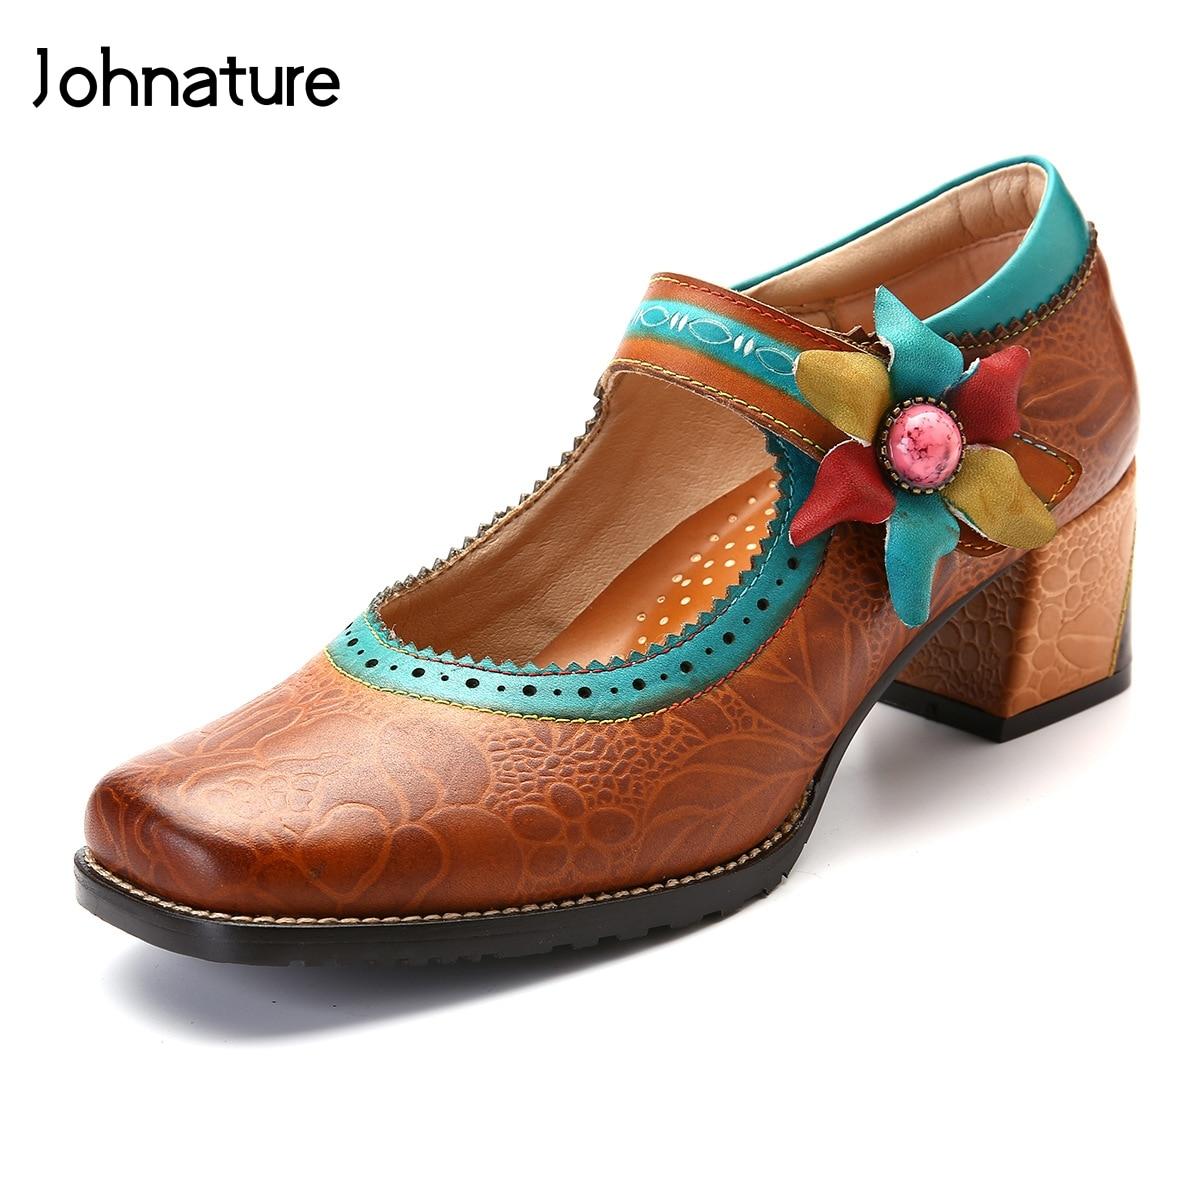 Johnature 2019 New Spring autumn Genuine Leather Square Toe Square Heel Retro Flower Appliques Handmade Women